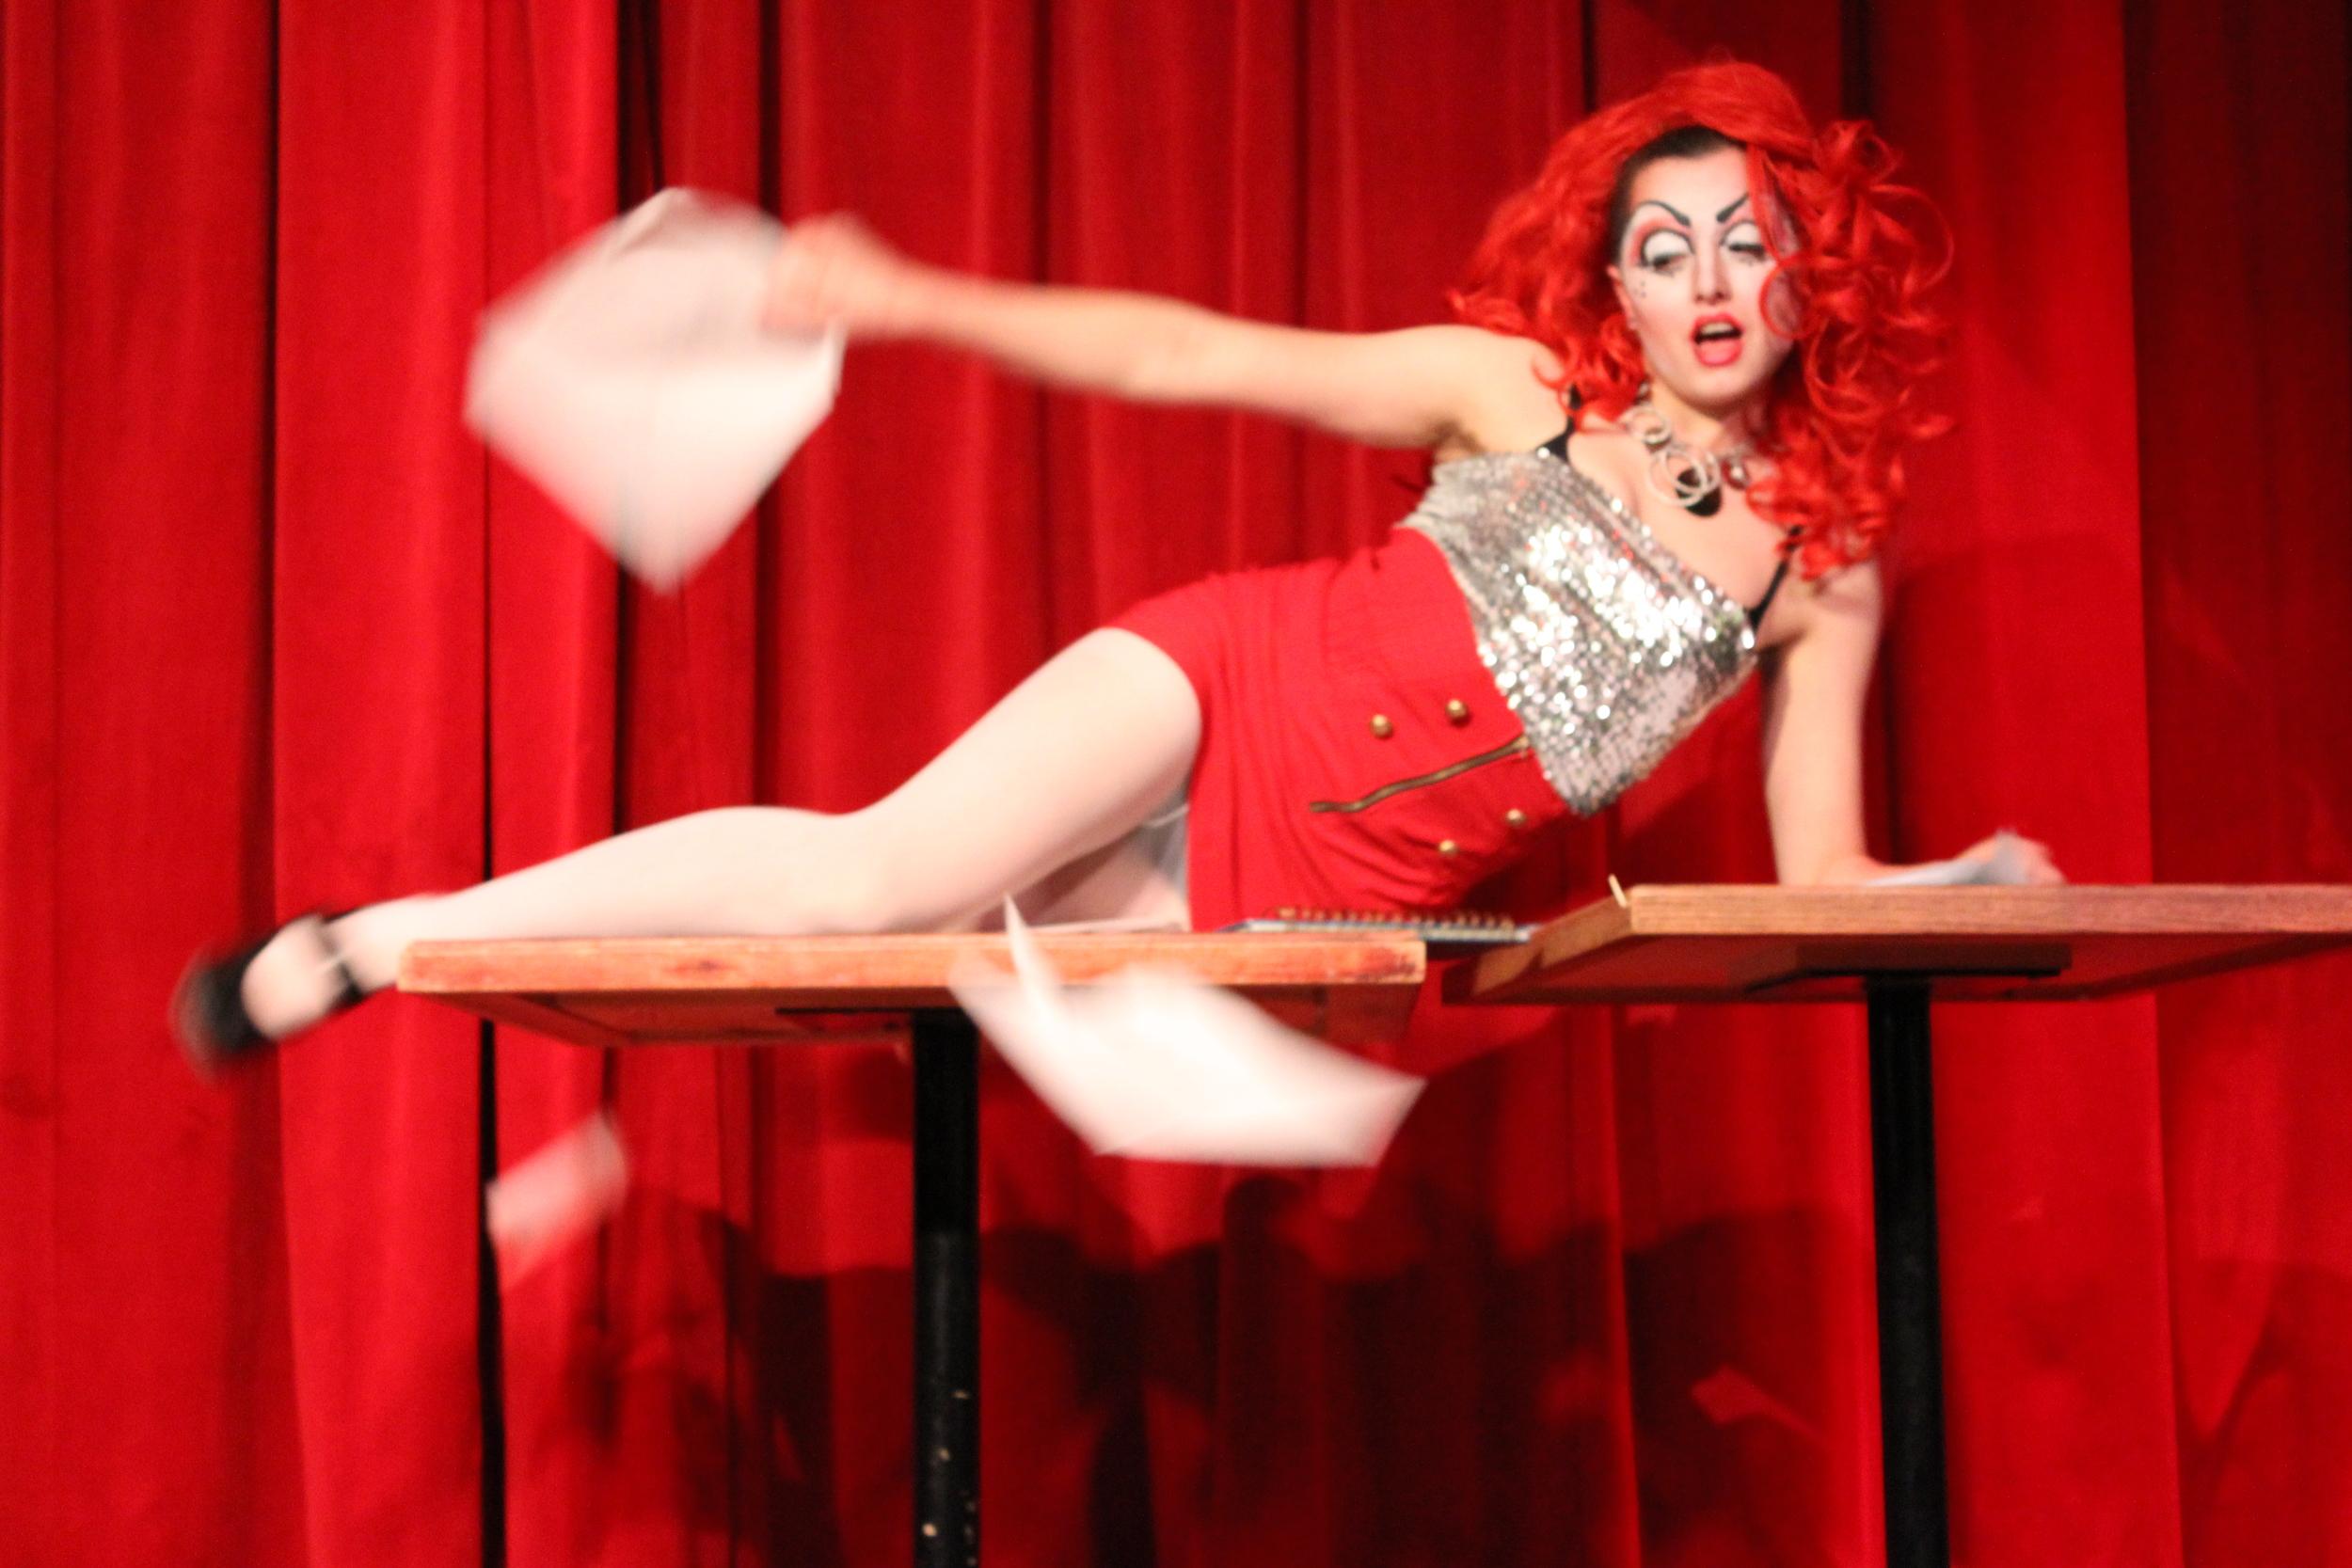 Burlesque performer Dot shows us what she thinks of paperwork at the fourth installment of  Gender Blender.   October 25, 2013, Cafe l'Artère, Montréal.